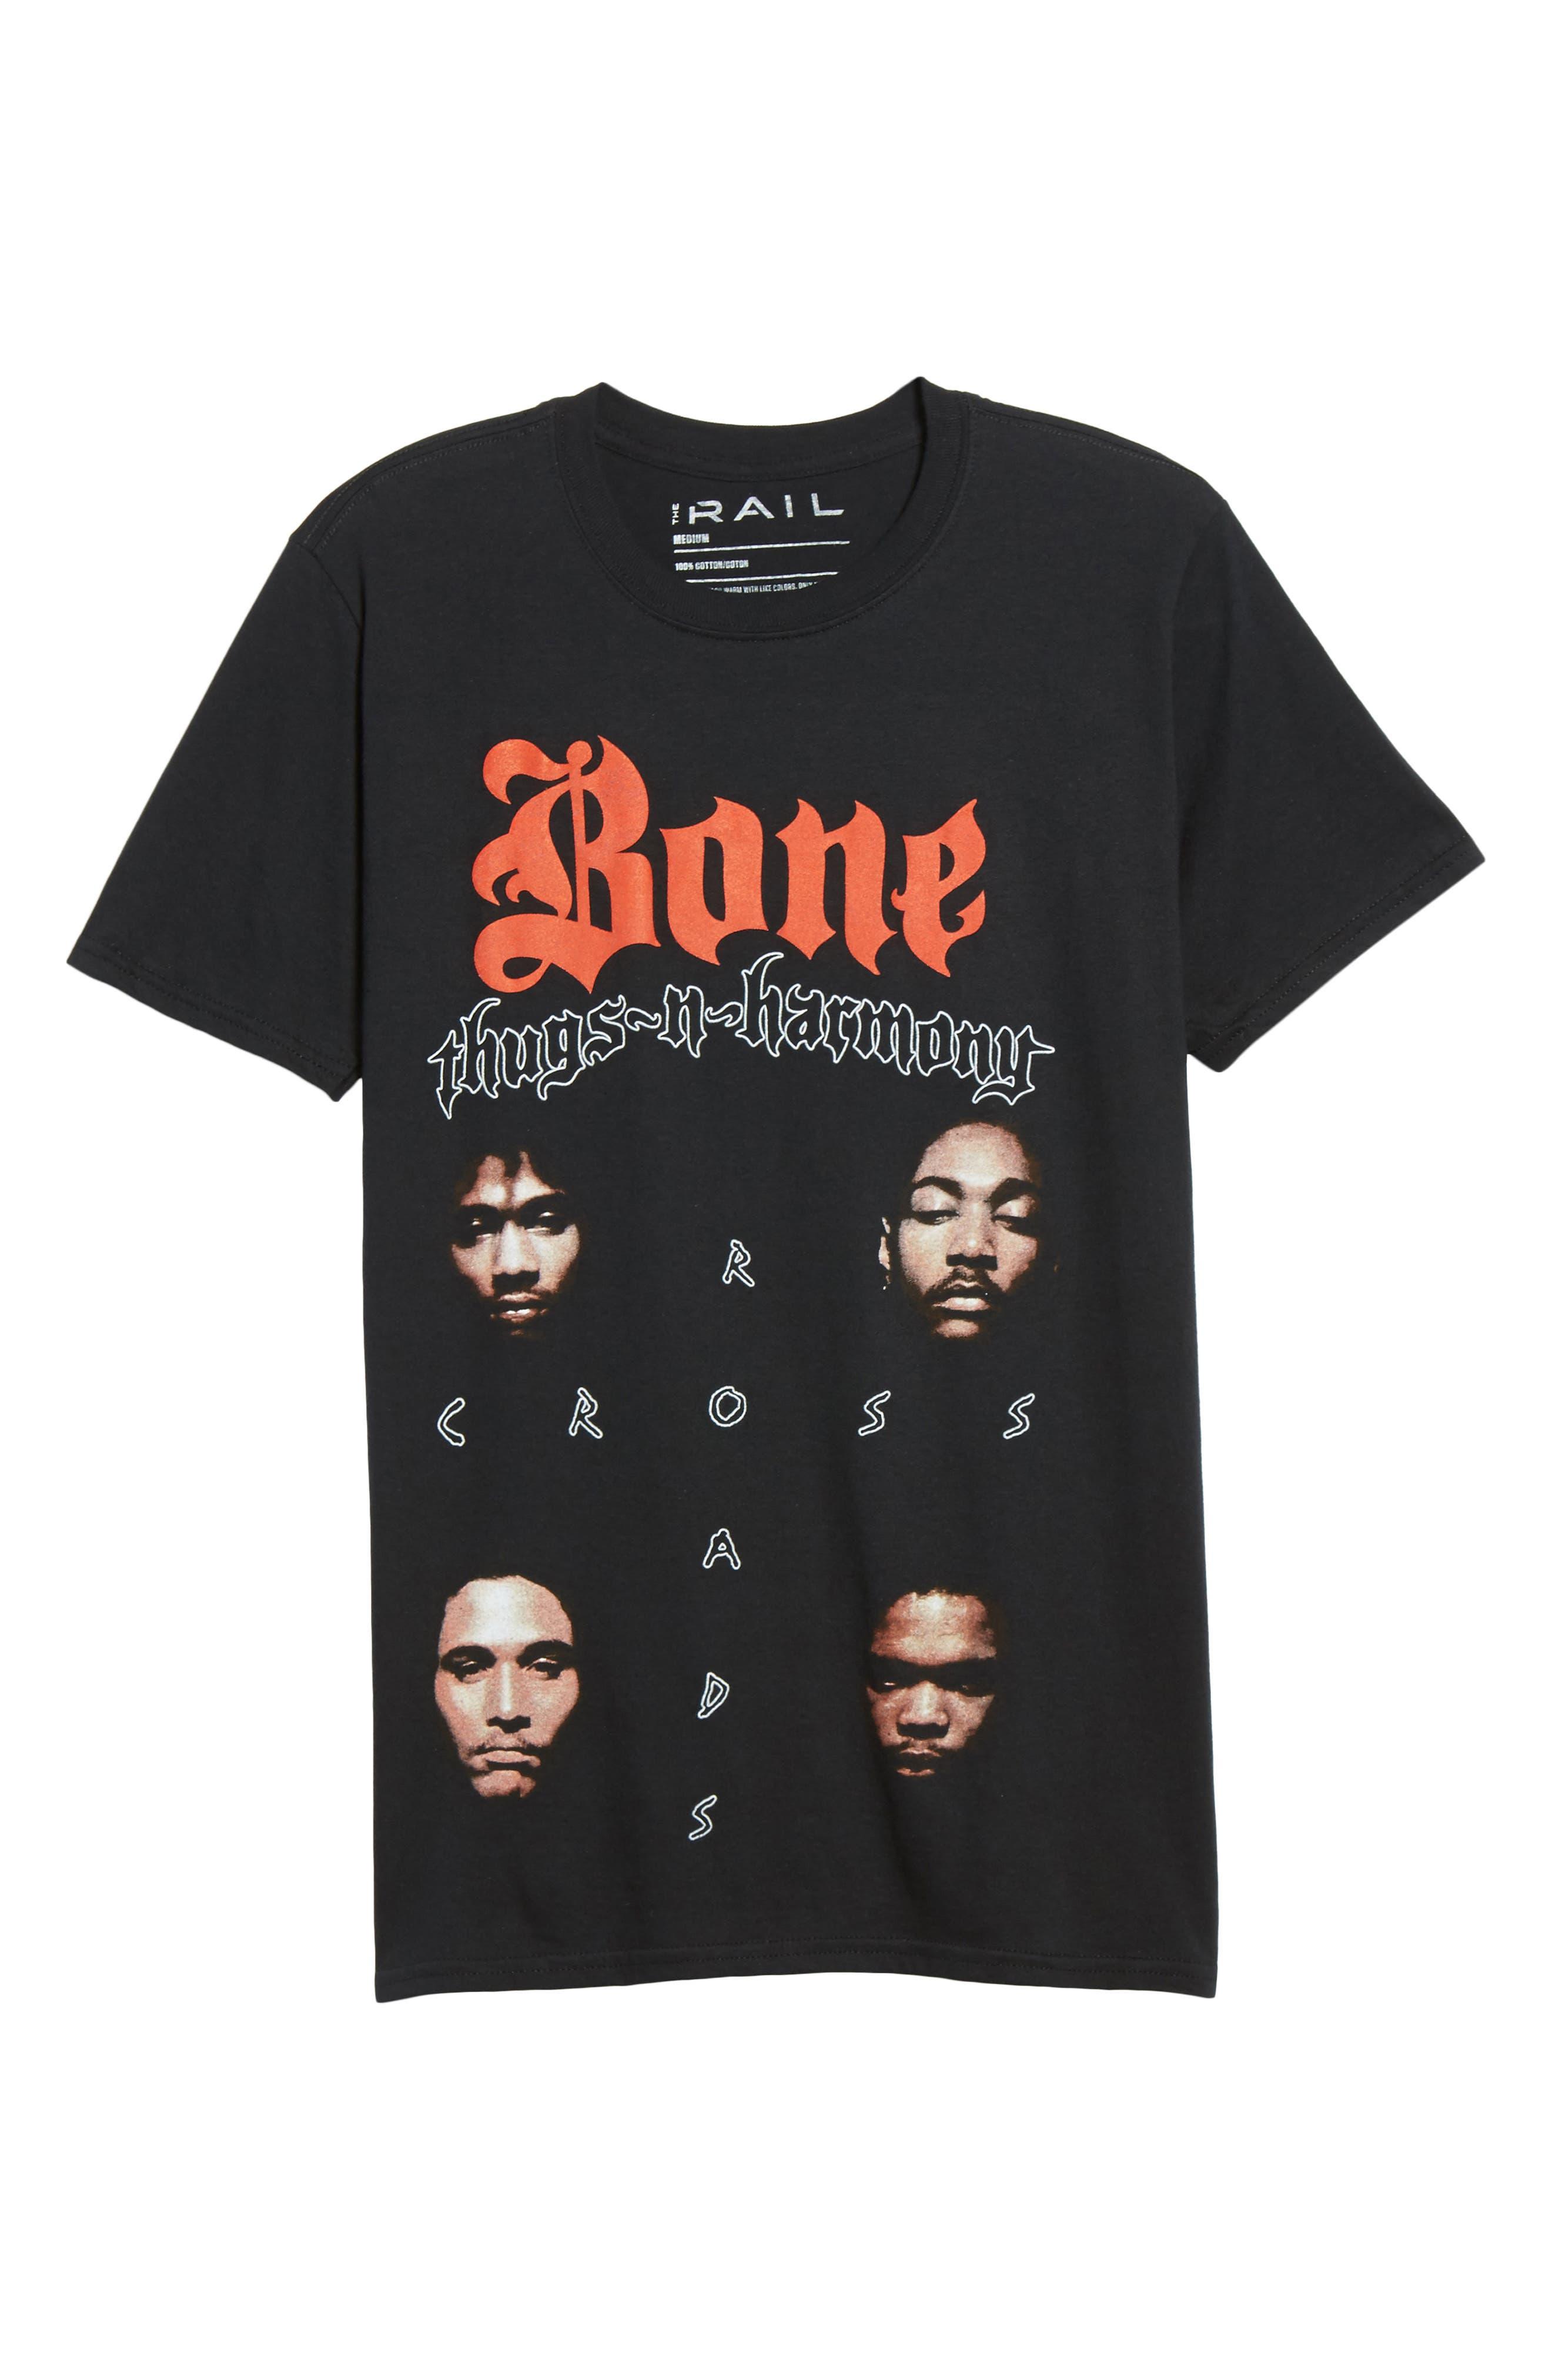 Bone Thugs-n-Harmony T-Shirt,                             Alternate thumbnail 6, color,                             Black Tee Bone Thugs